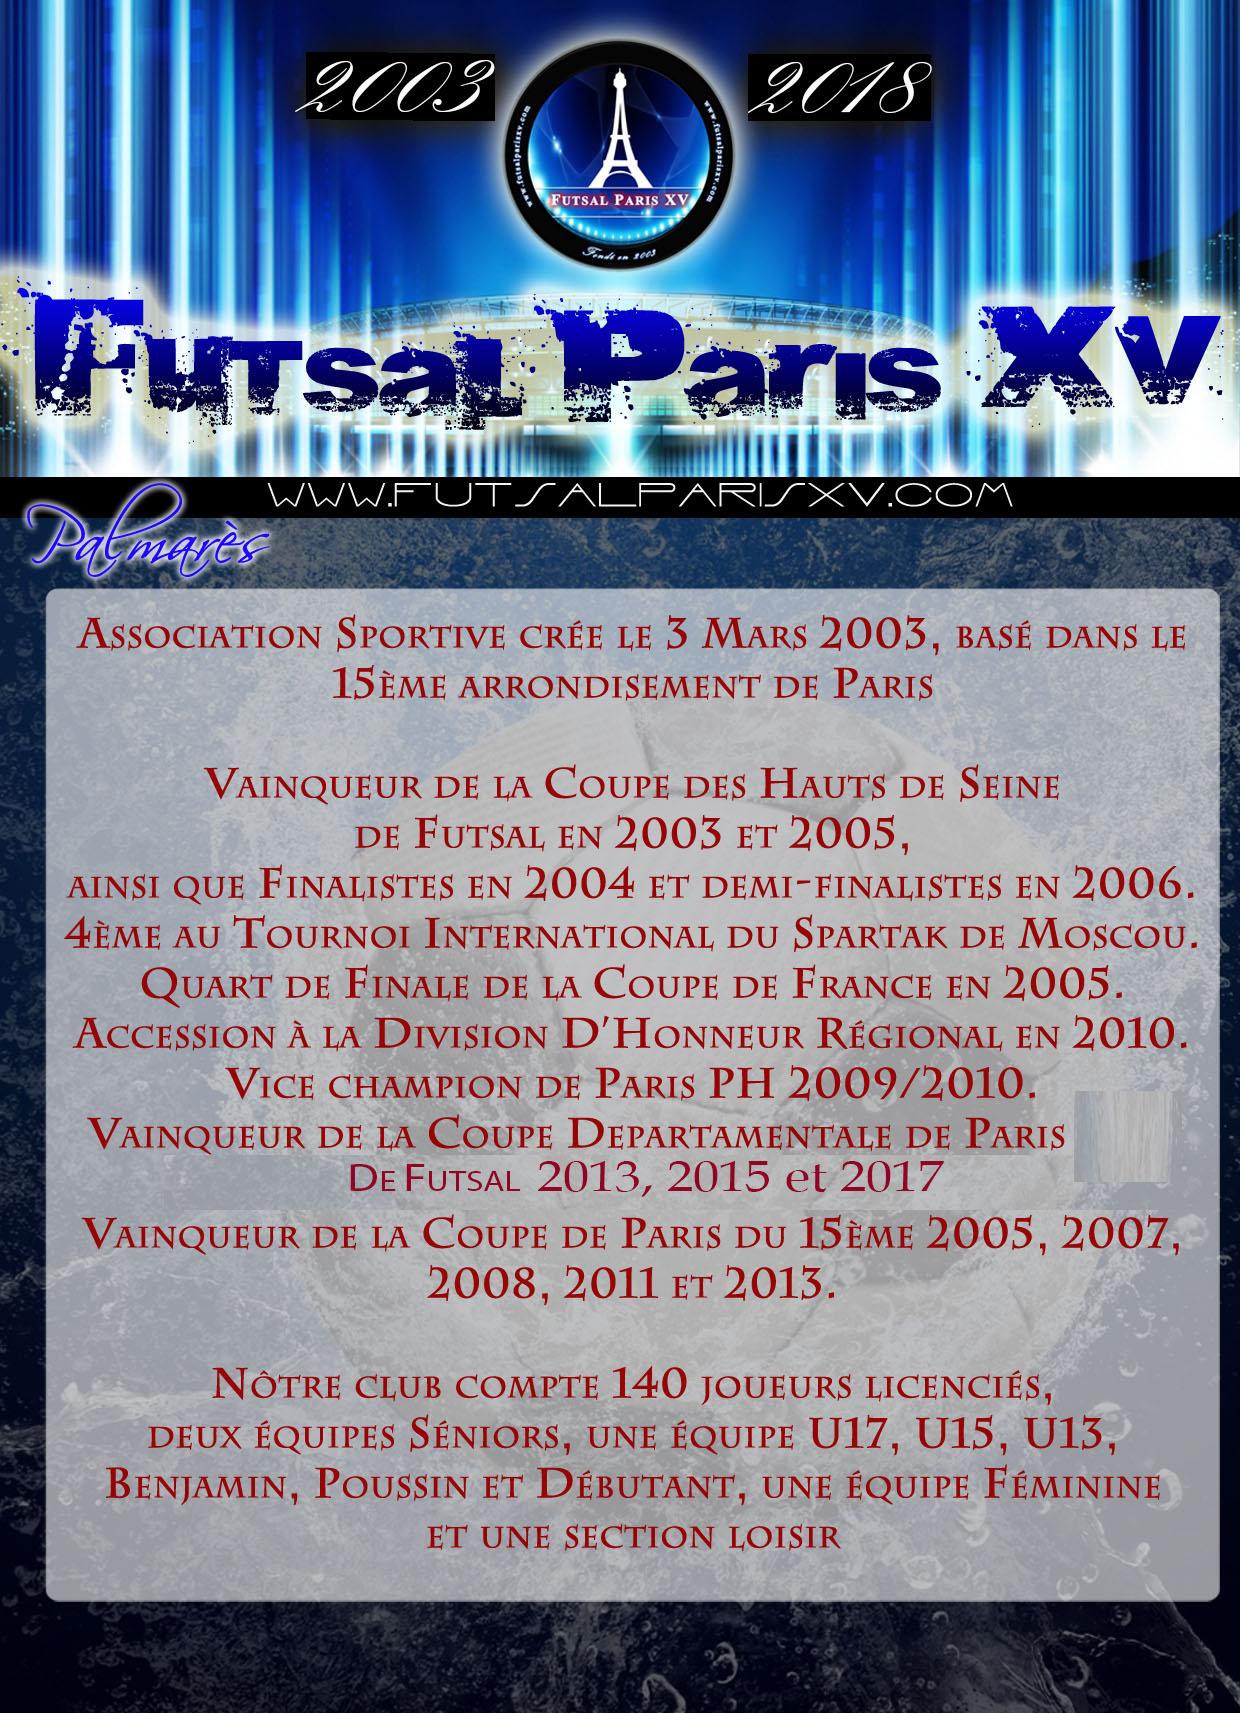 PALMARES FPXV.jpg